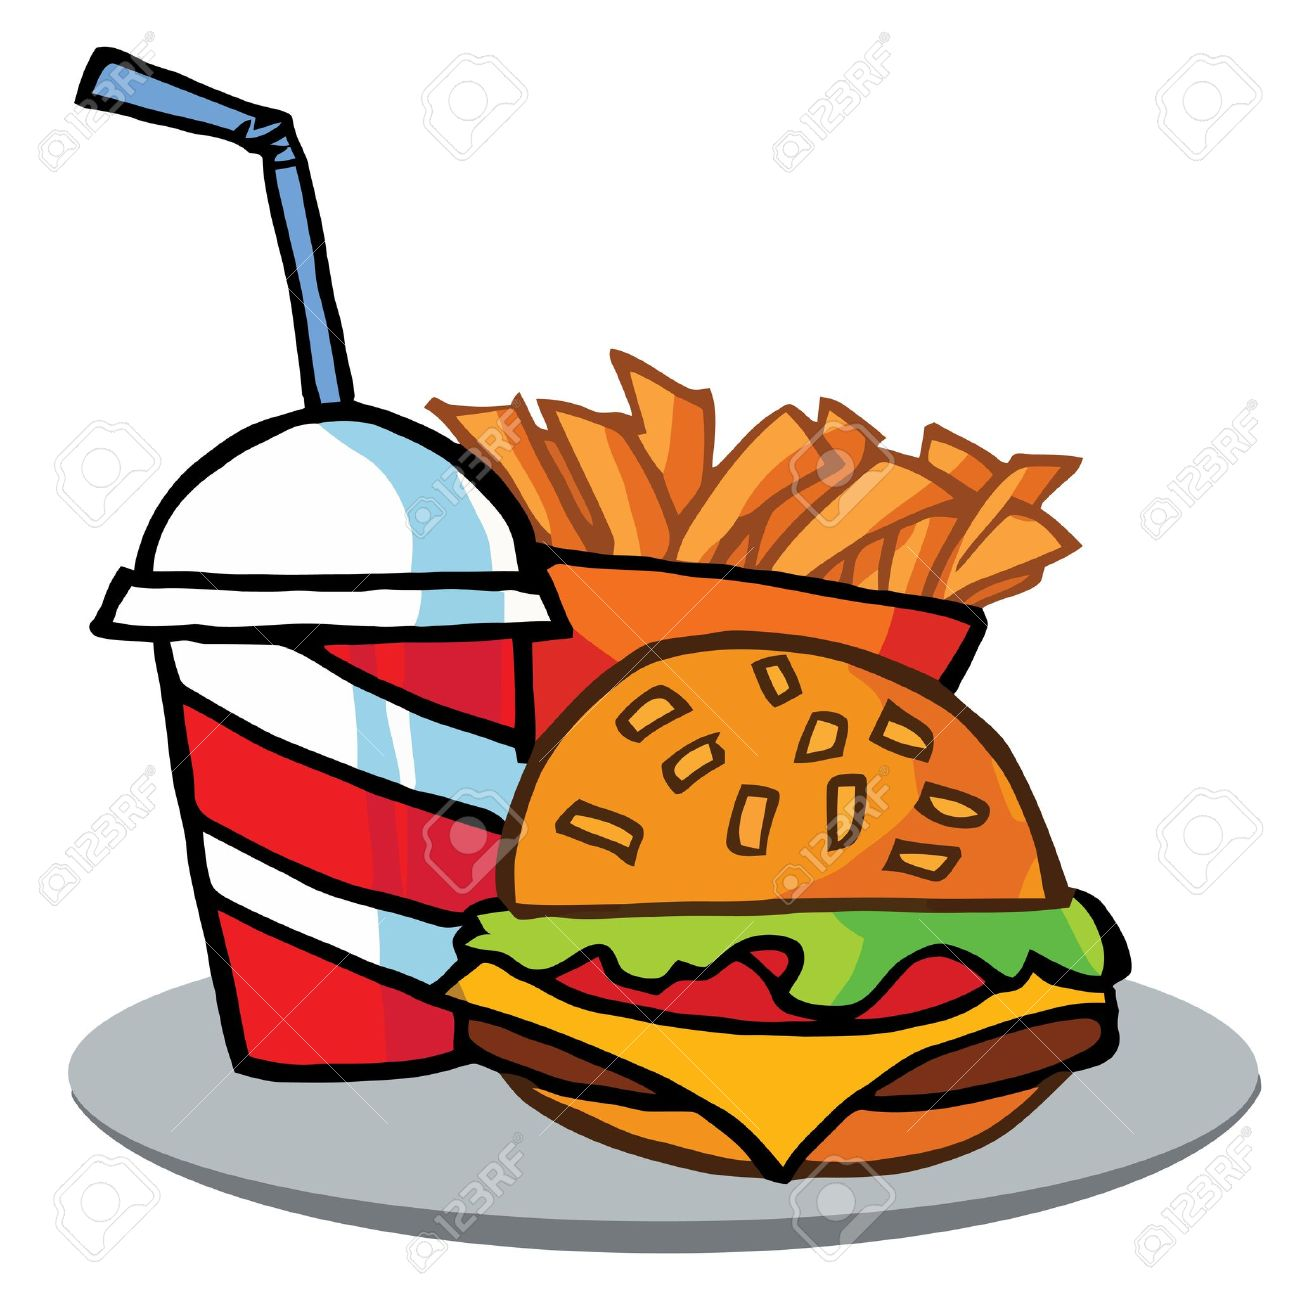 Cola, Fries And Cheeseburger Stock Vector - 6792622